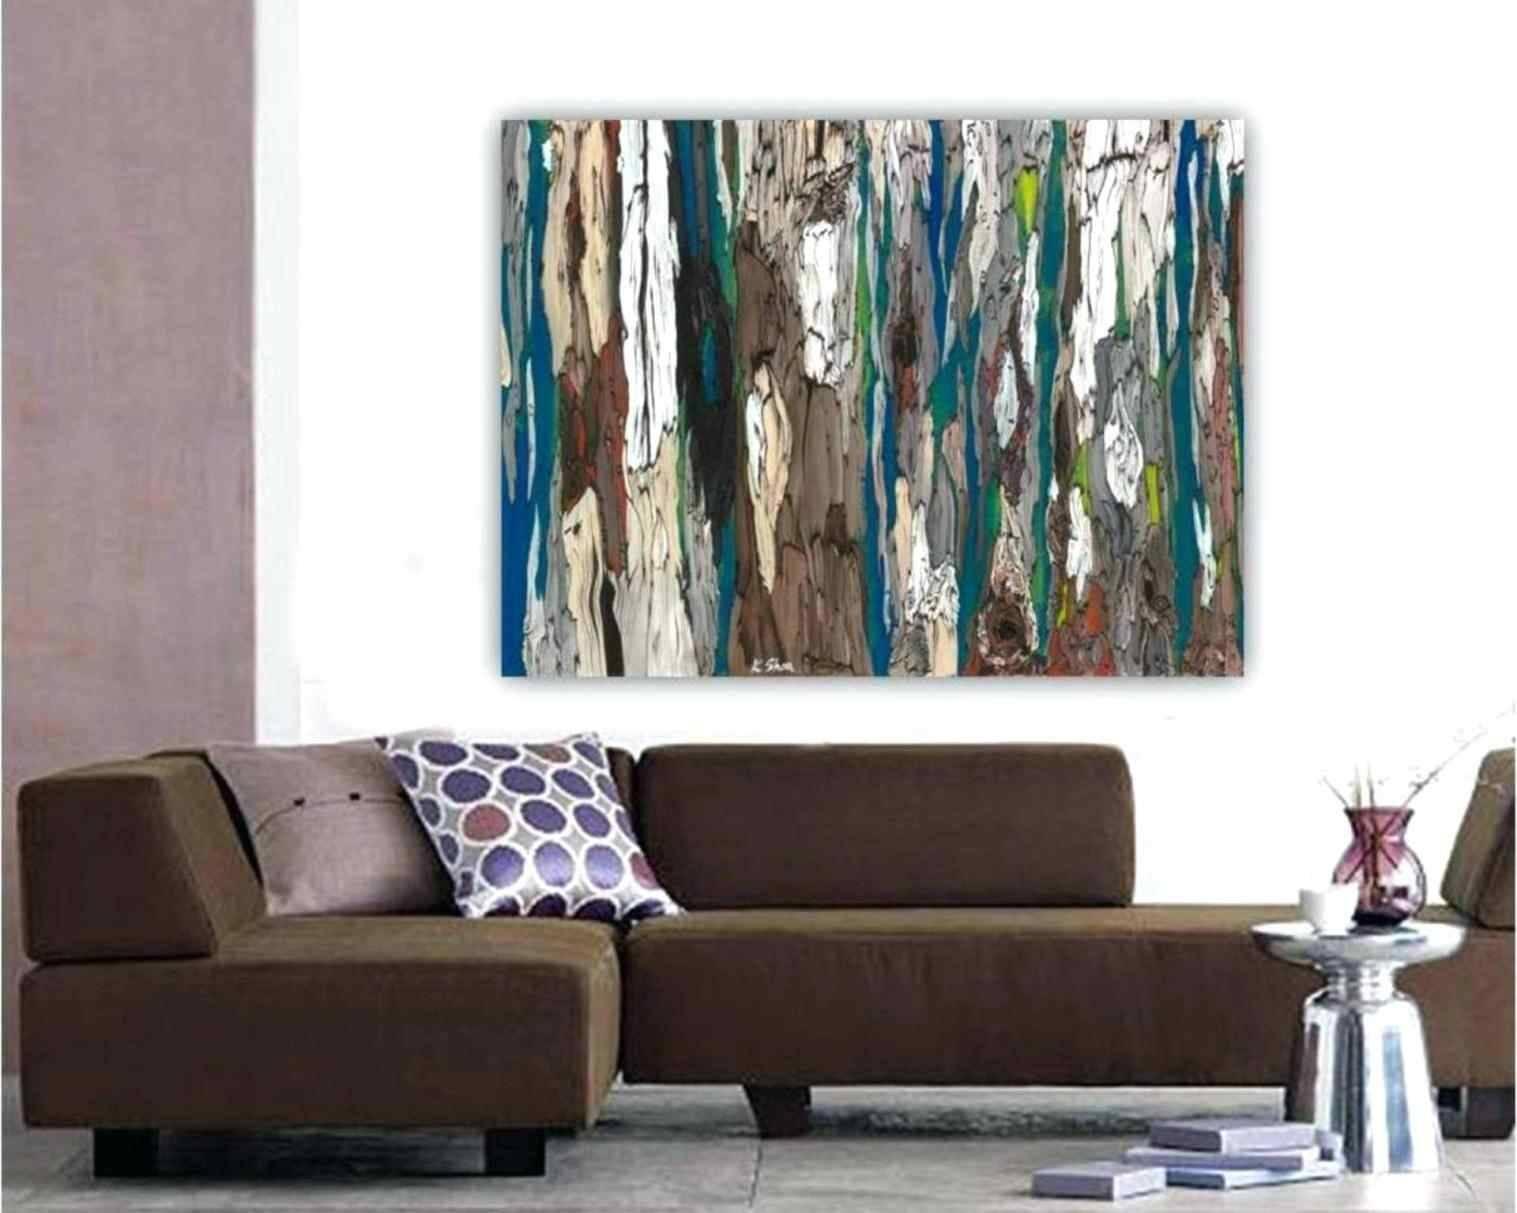 Multi Color Metal Wall Art | Home Interior Decor In Most Up To Date Multi Color Metal Wall Art (View 13 of 20)